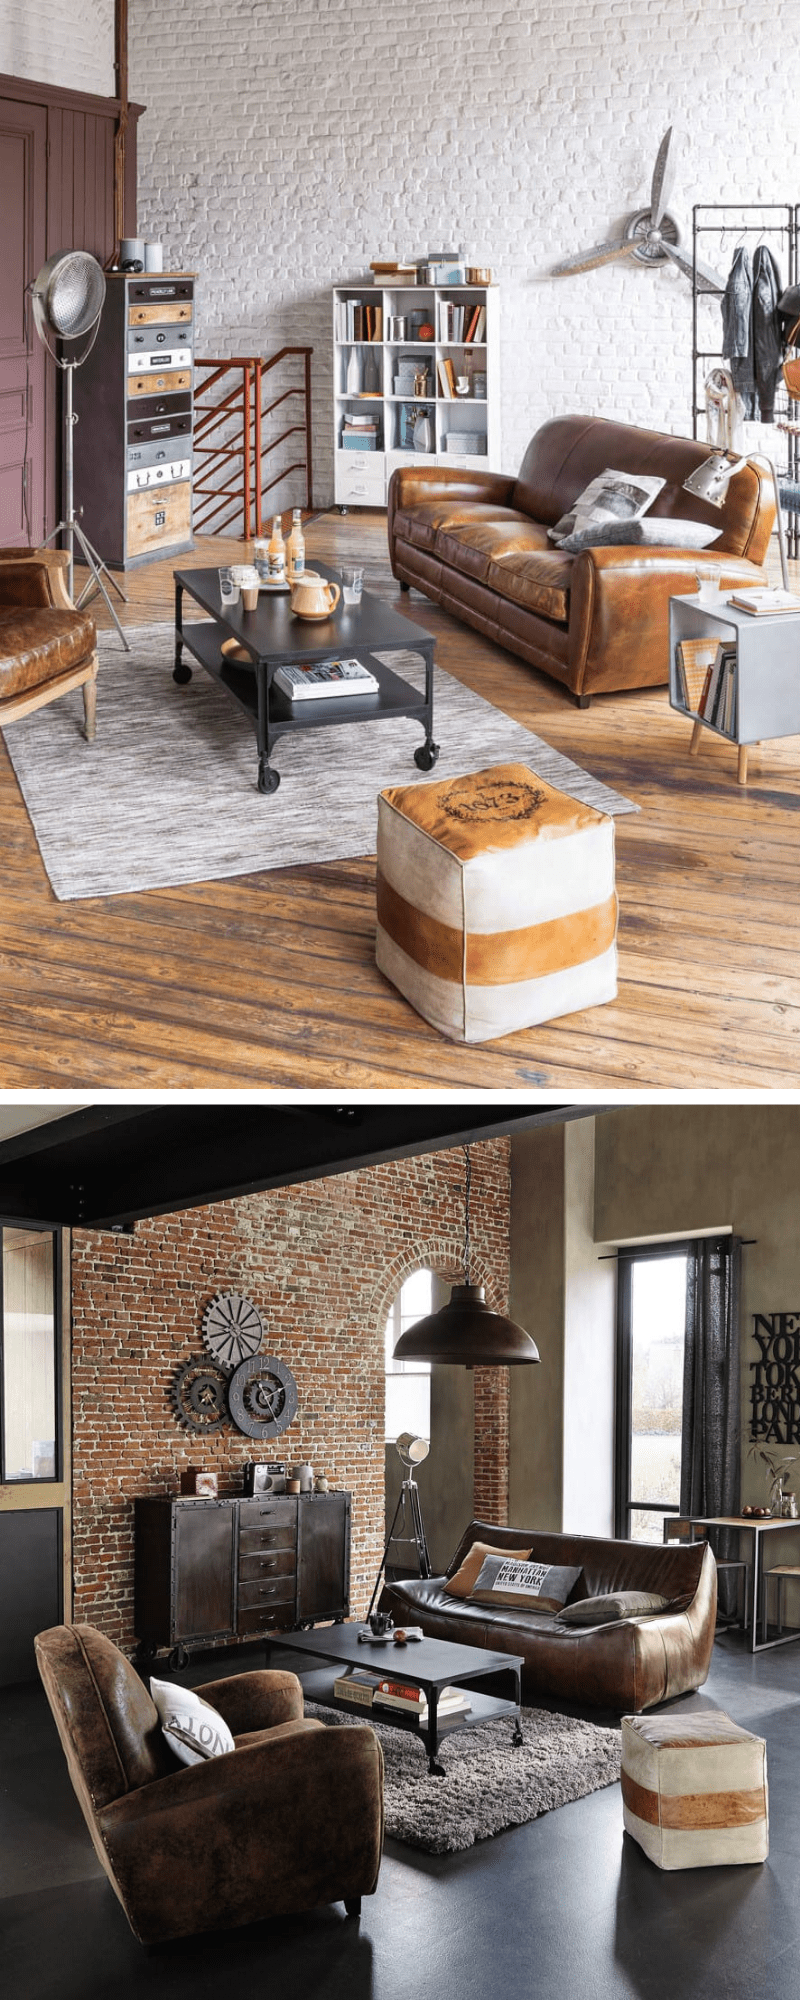 Goatskin Leather and Cotton Pouffe (£87, Maisons du Monde) industrial style loft decor